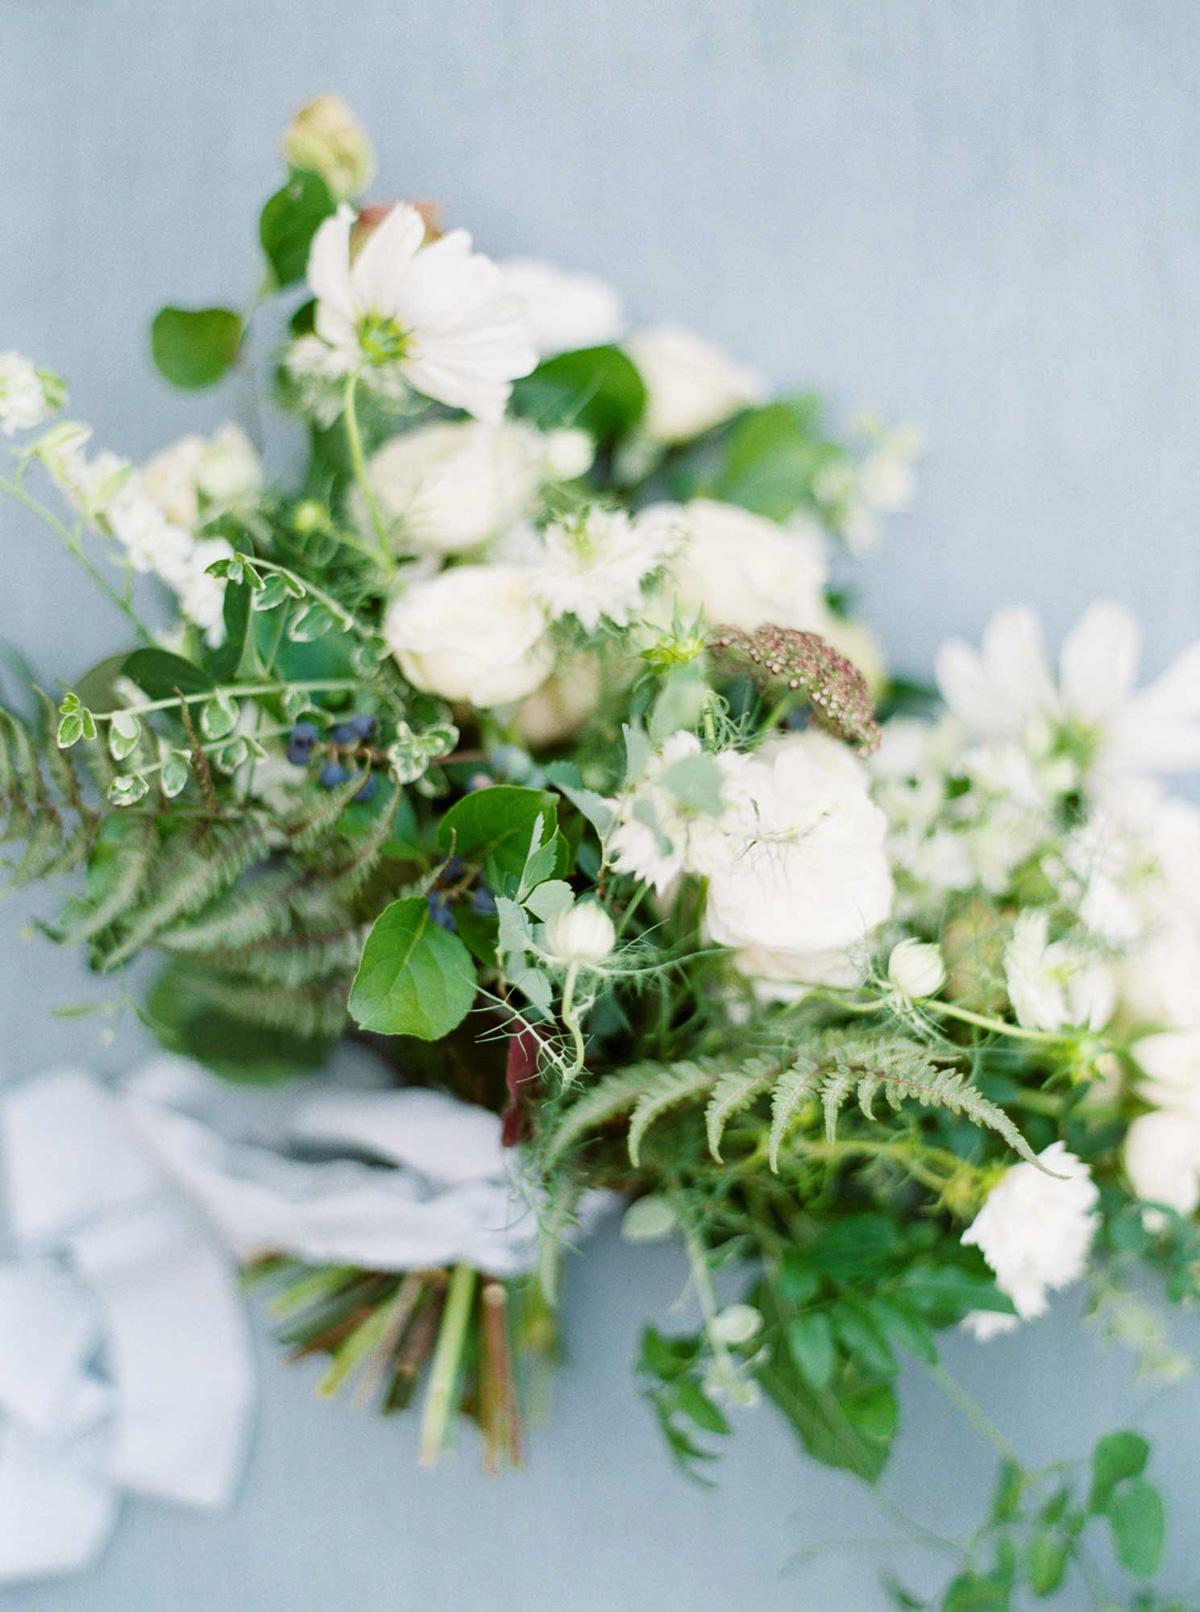 kayla-yestal-vineyard-bride-swish-list-woodland-weddings-niagara-wedding-editorial-14.jpg